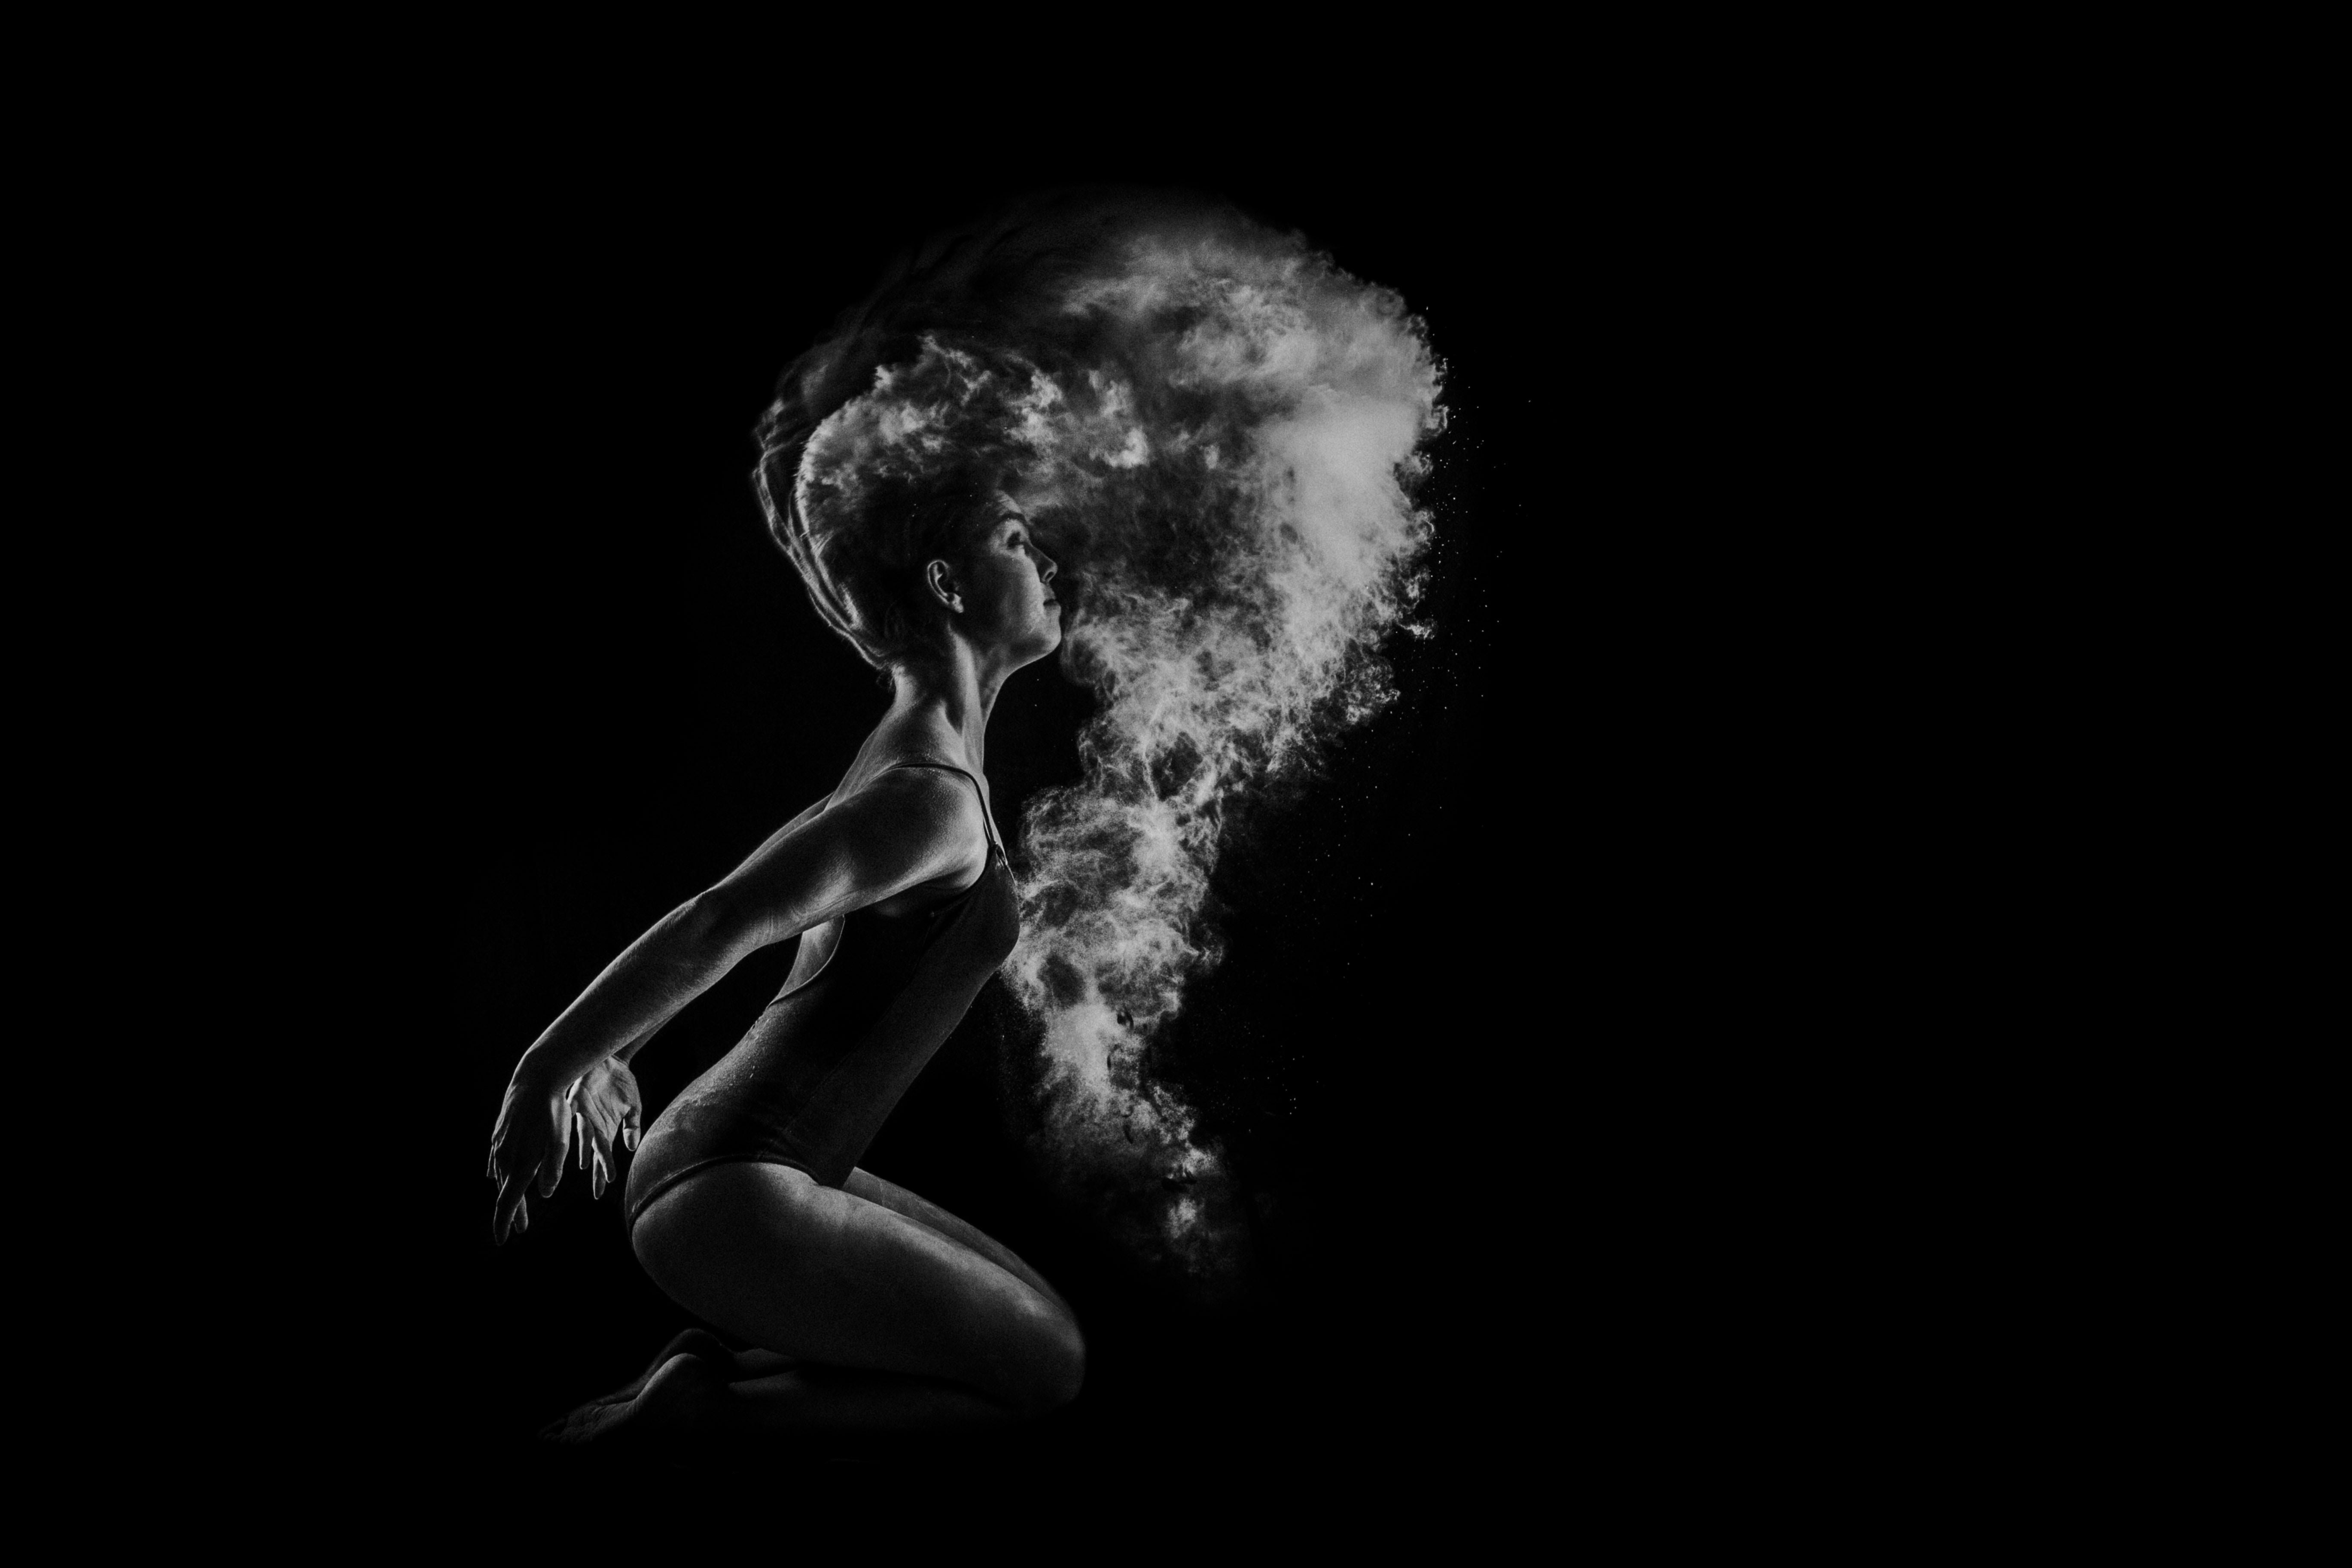 Black and white shot of female dancer kneeling with powder flying in air, Matosinhos